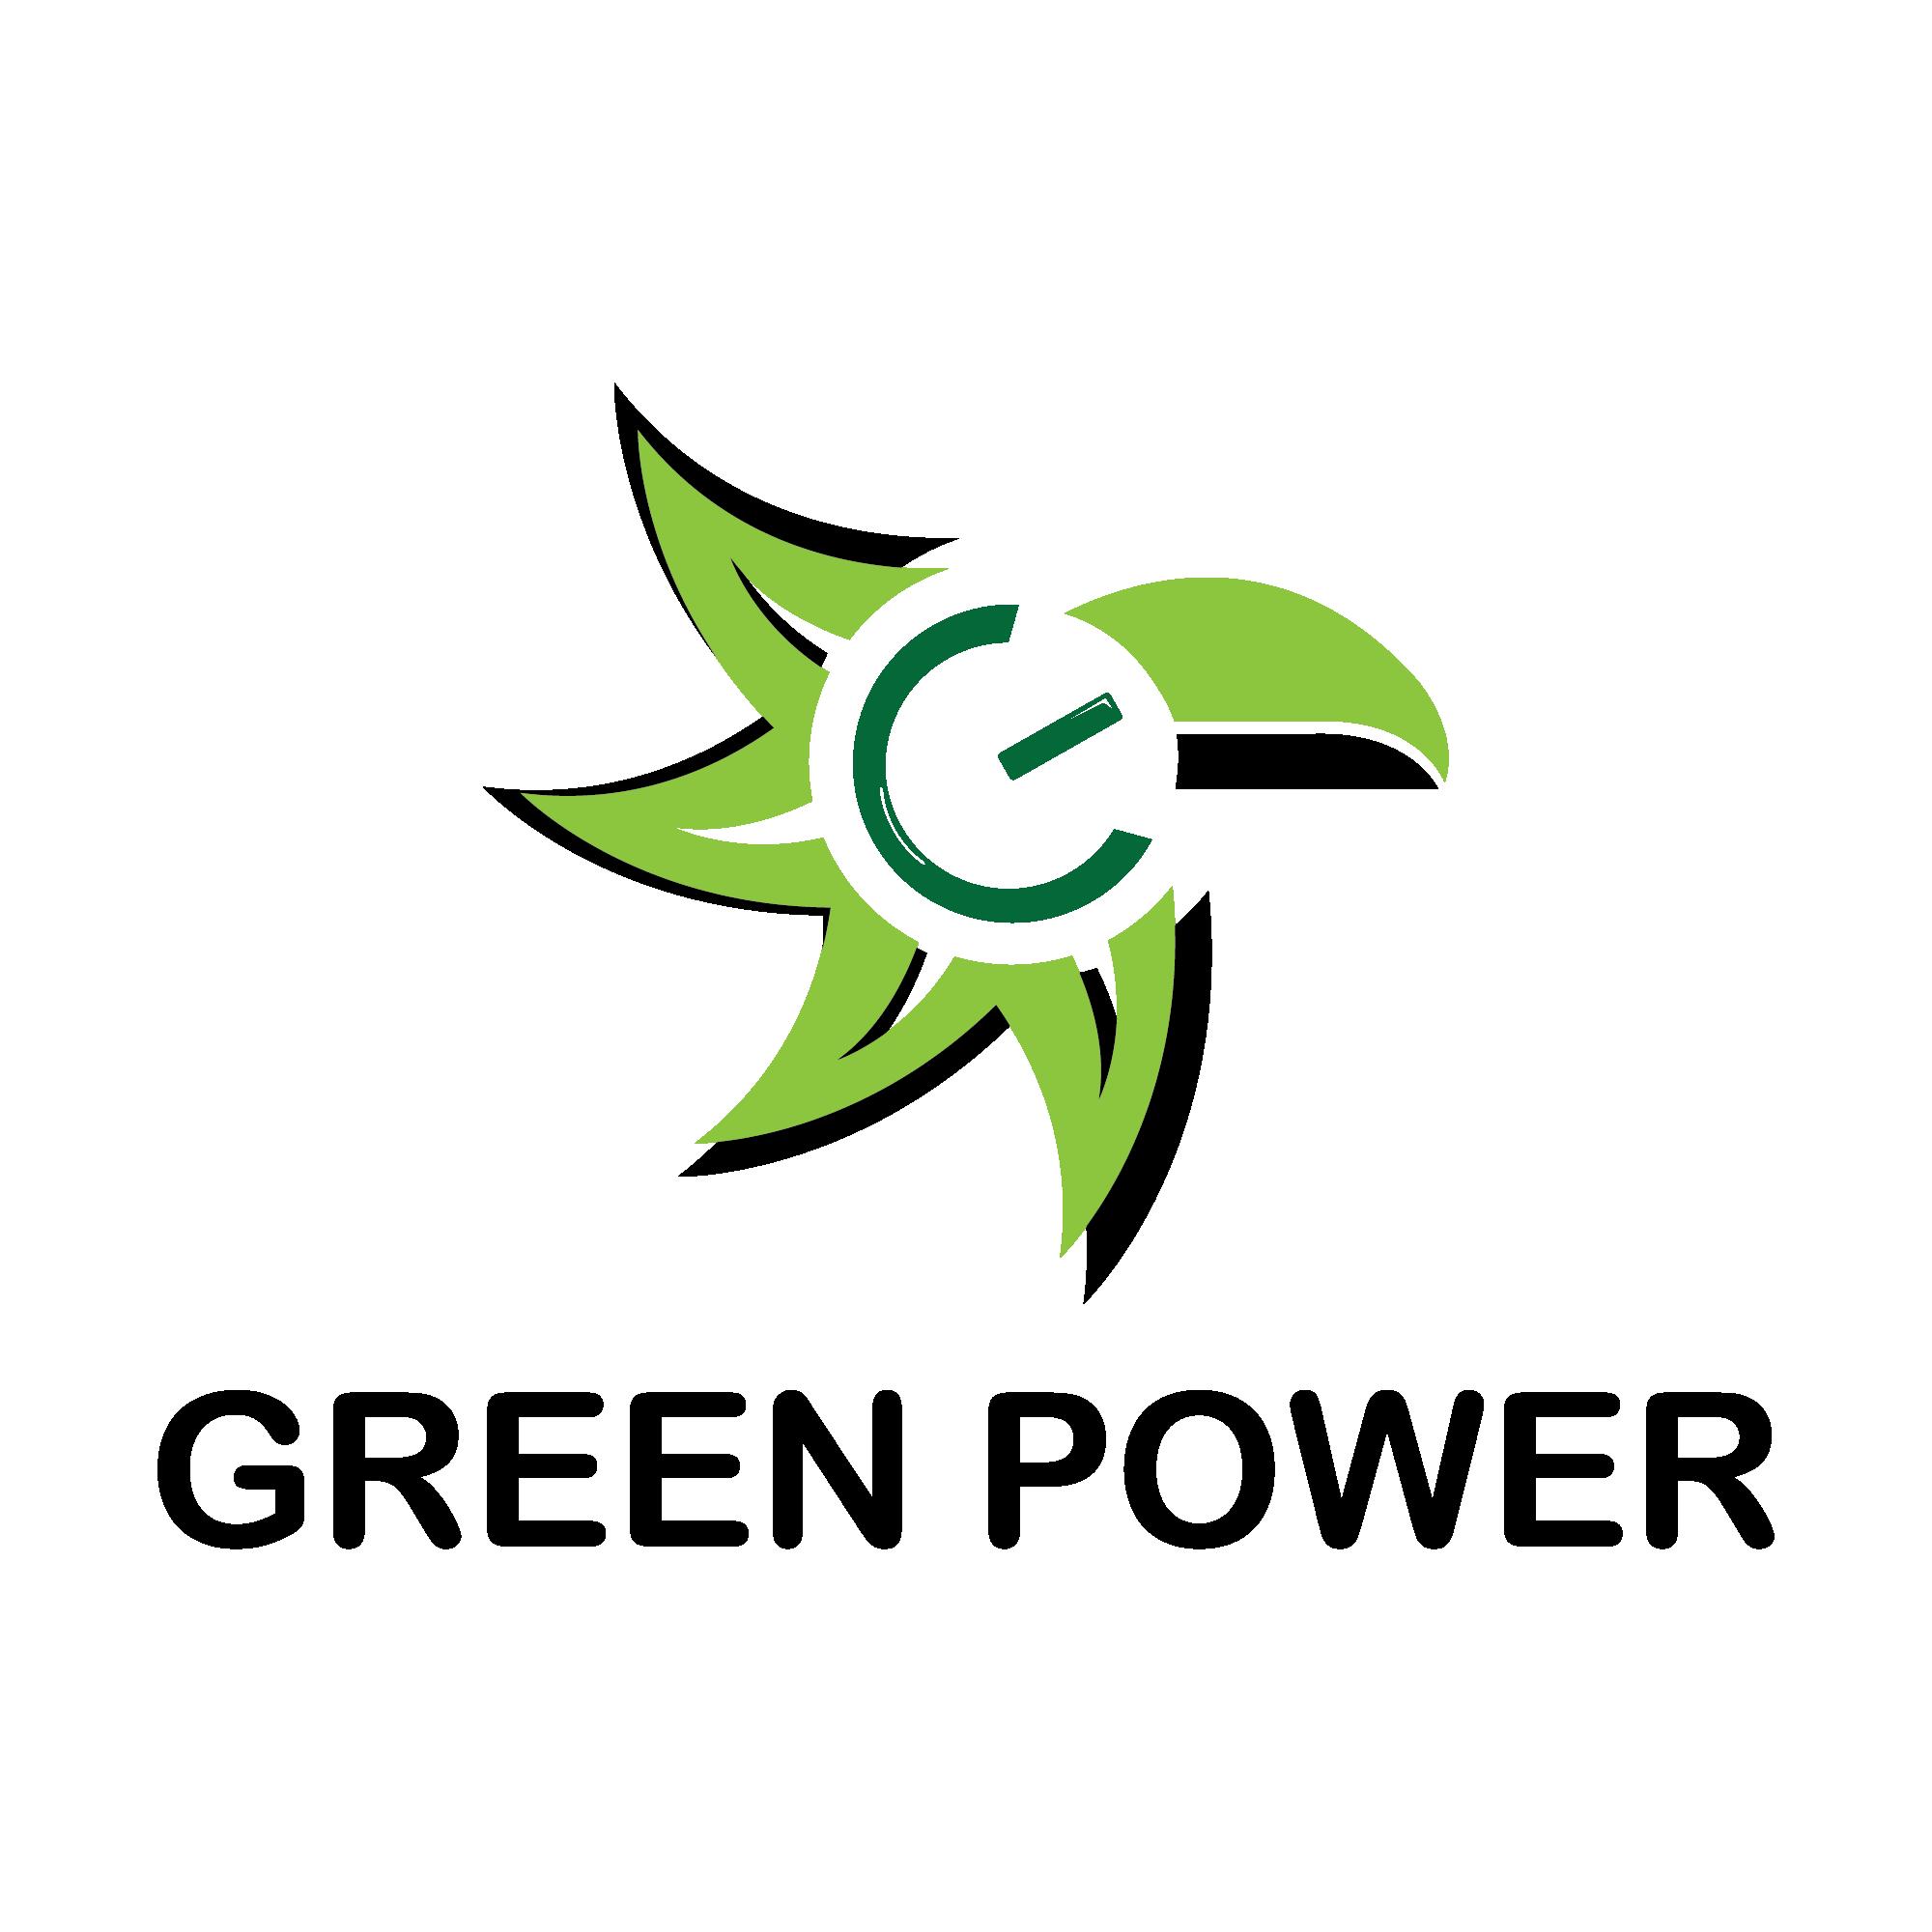 Logo Maker Premium Logos For Sale Brandcrowd Logos Logo Maker Logo Design